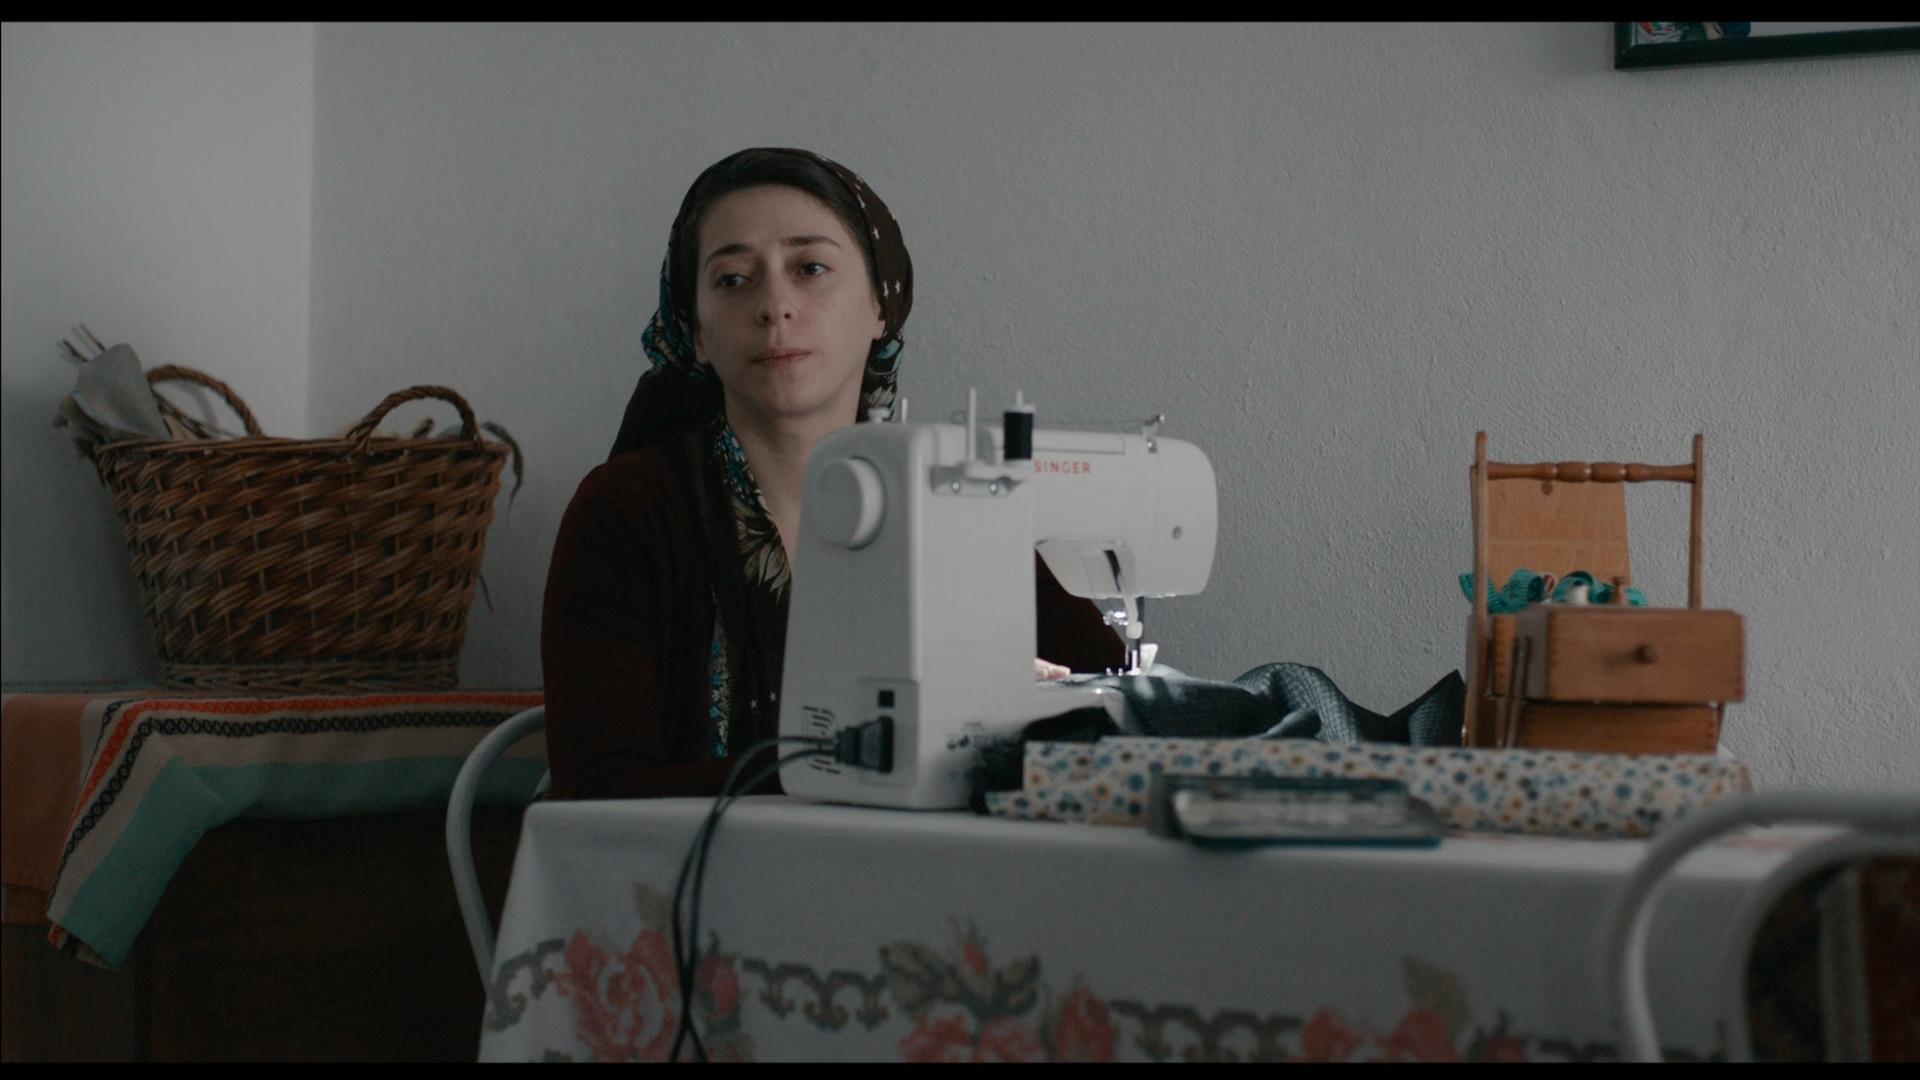 Soluk   2019   Yerli Film   WEB-DL   XviD   Sansürsüz   1080p - m720p - m1080p   WEB-DL   Tek Link